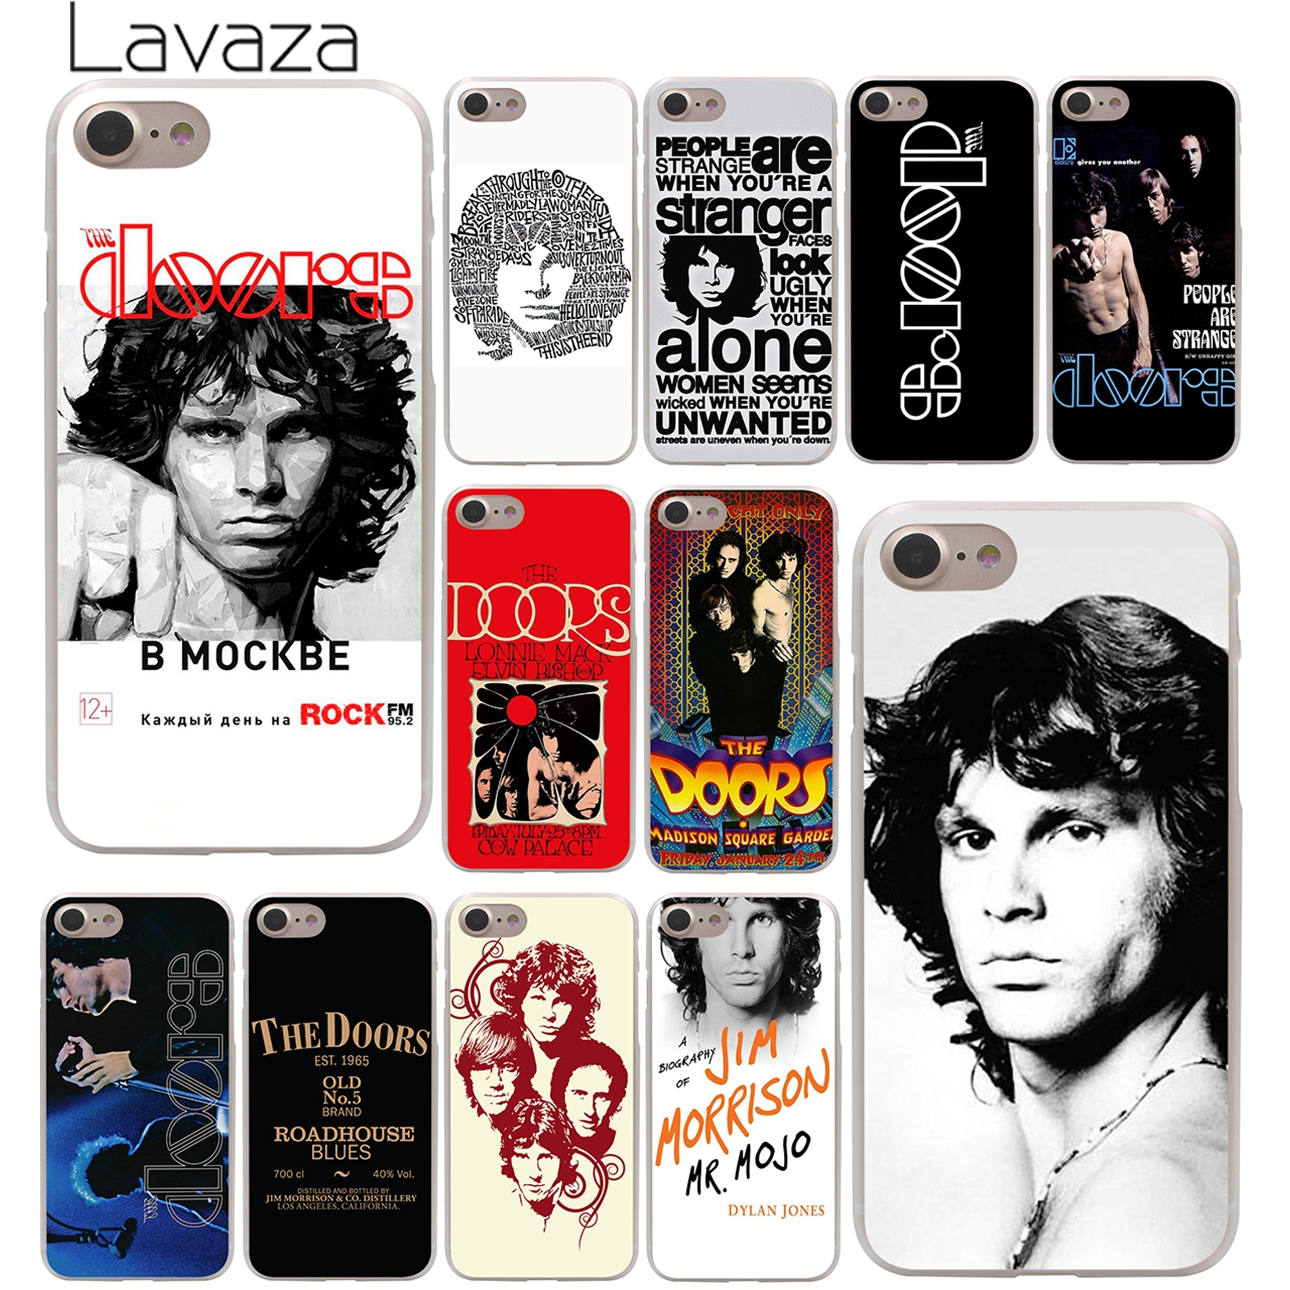 Lavaza The doors JIM MORRISON Hard Phone Cover Case for Apple iPhone X XR XS Max 6 6S 7 8 Plus 5 5S SE 5C 4S 10 Cases